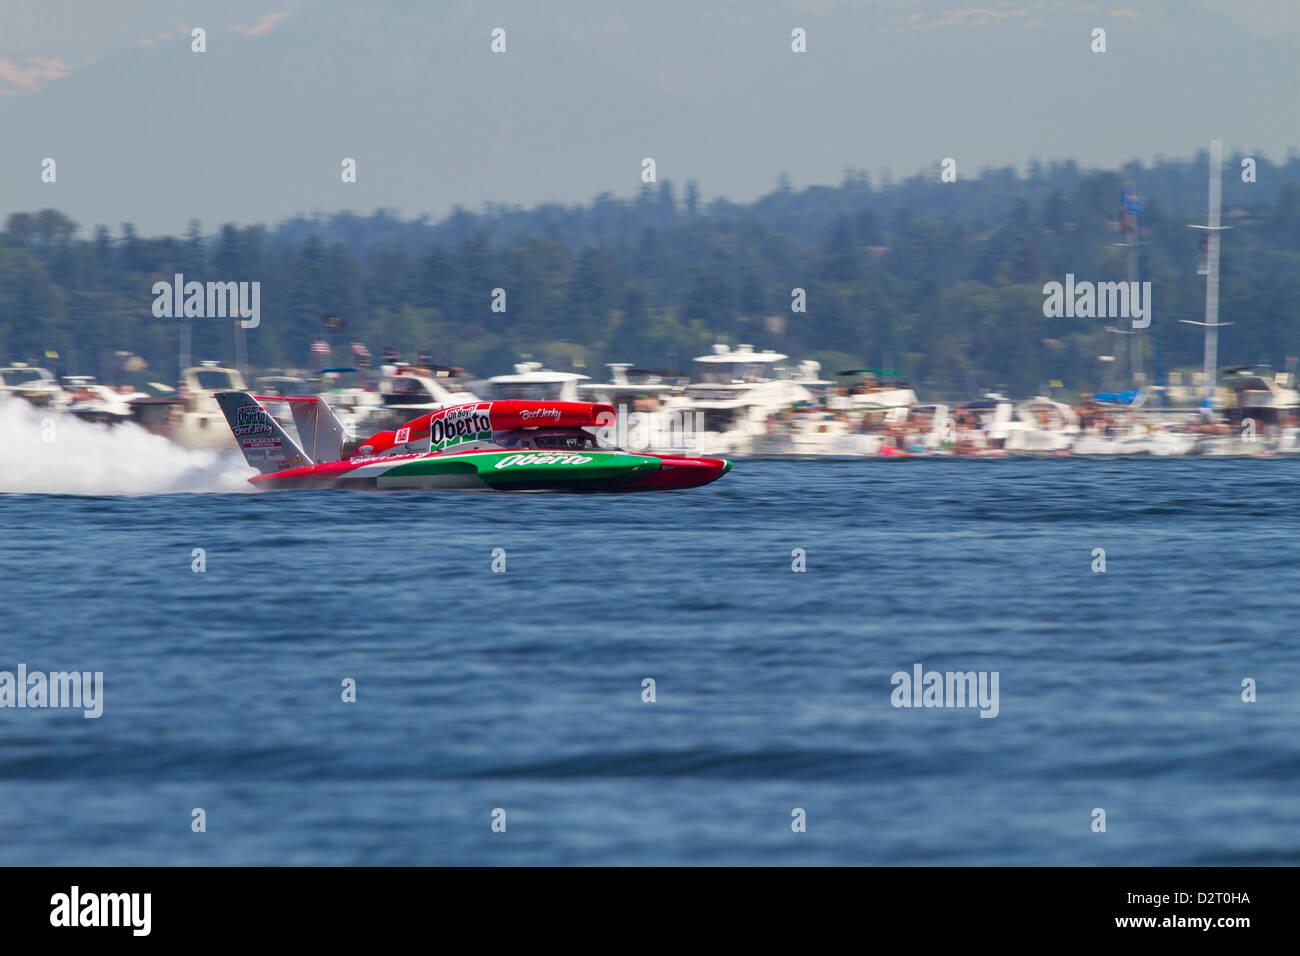 WA, Seattle, Seafair, Unlimited Hydroplane Races, Lake Washington